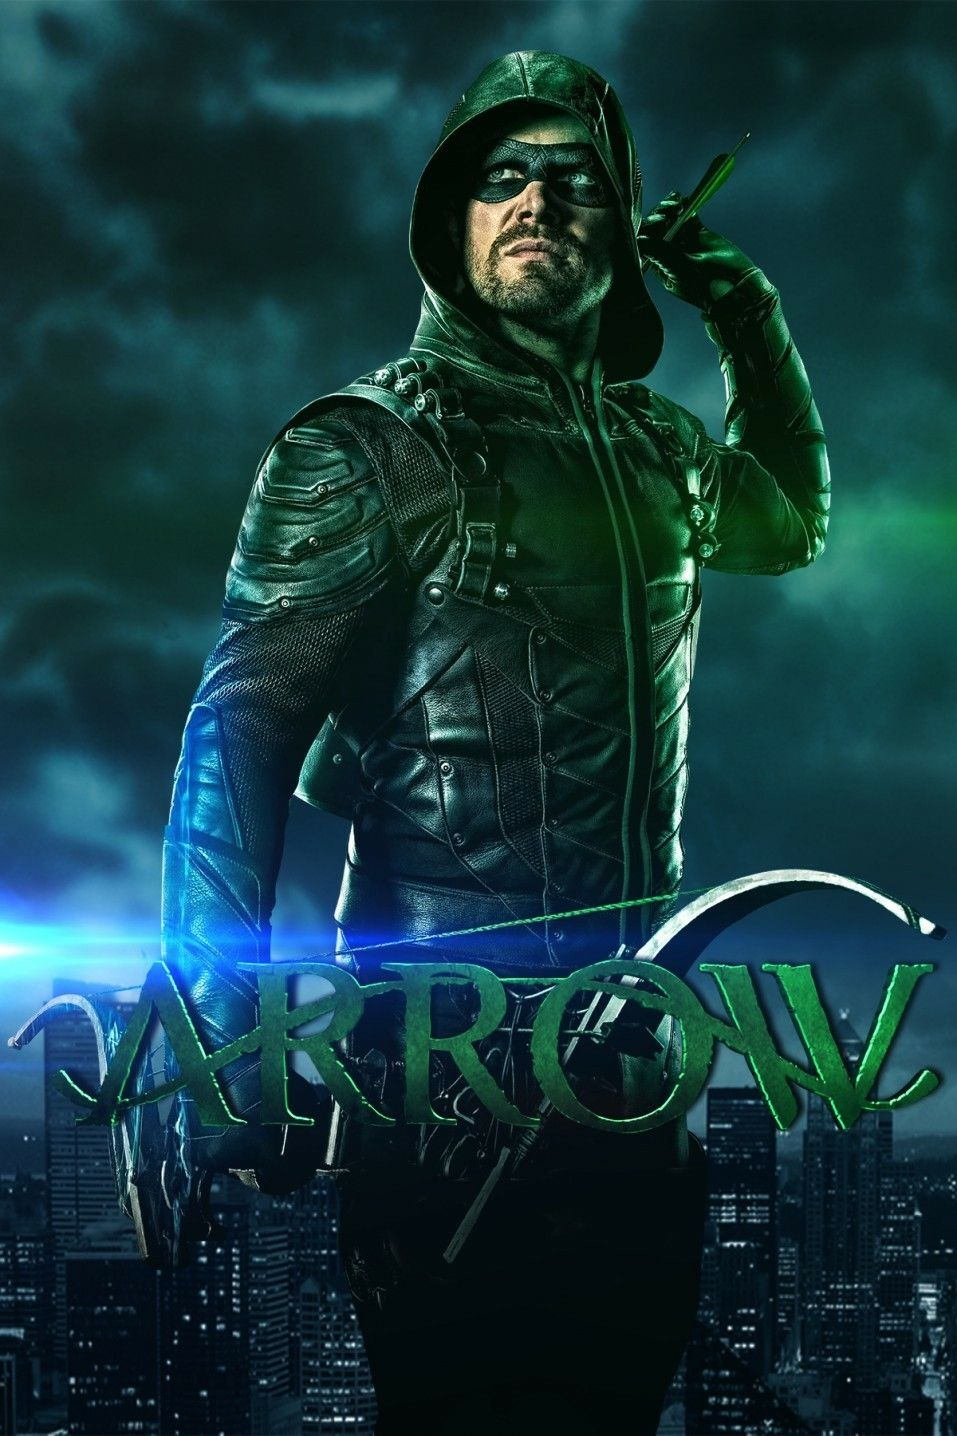 Pin By Bruce Wayne On Green Arrow Green Arrow Green Arrow Smallville Arrow Dc Comics